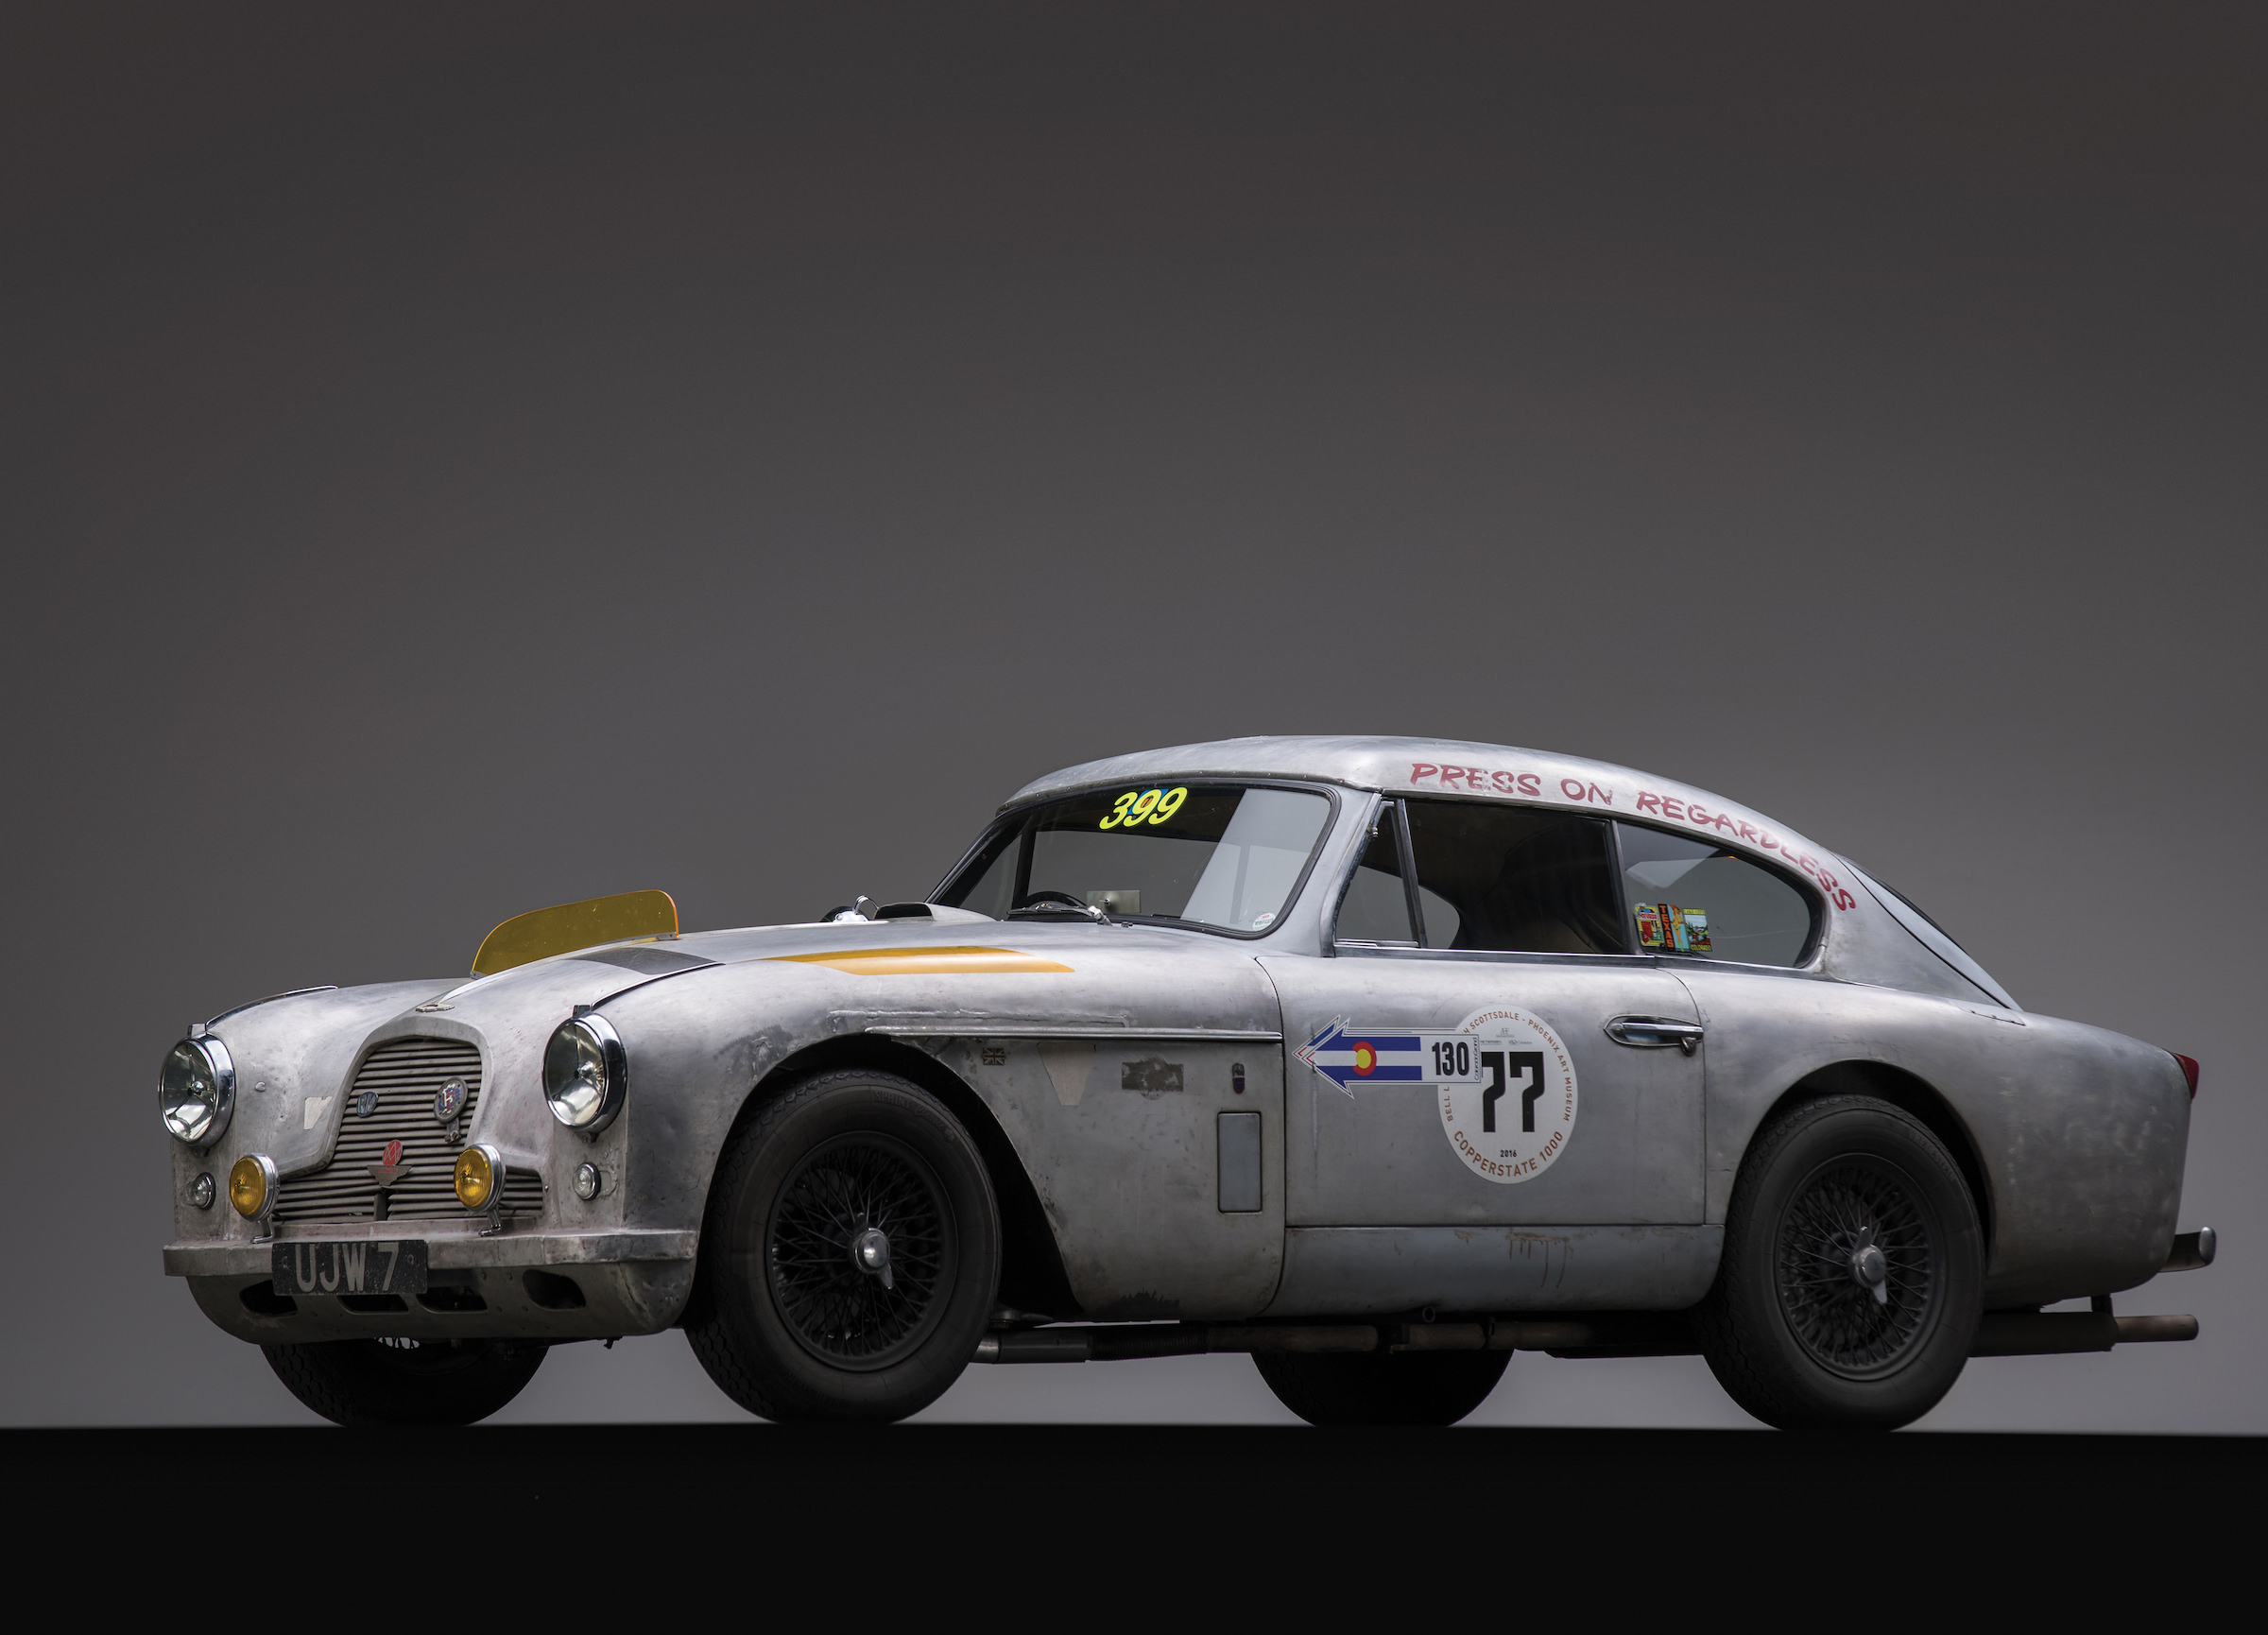 1957 Aston Martin Db2 4 Mk Ii The Aston That Can T Be Killed